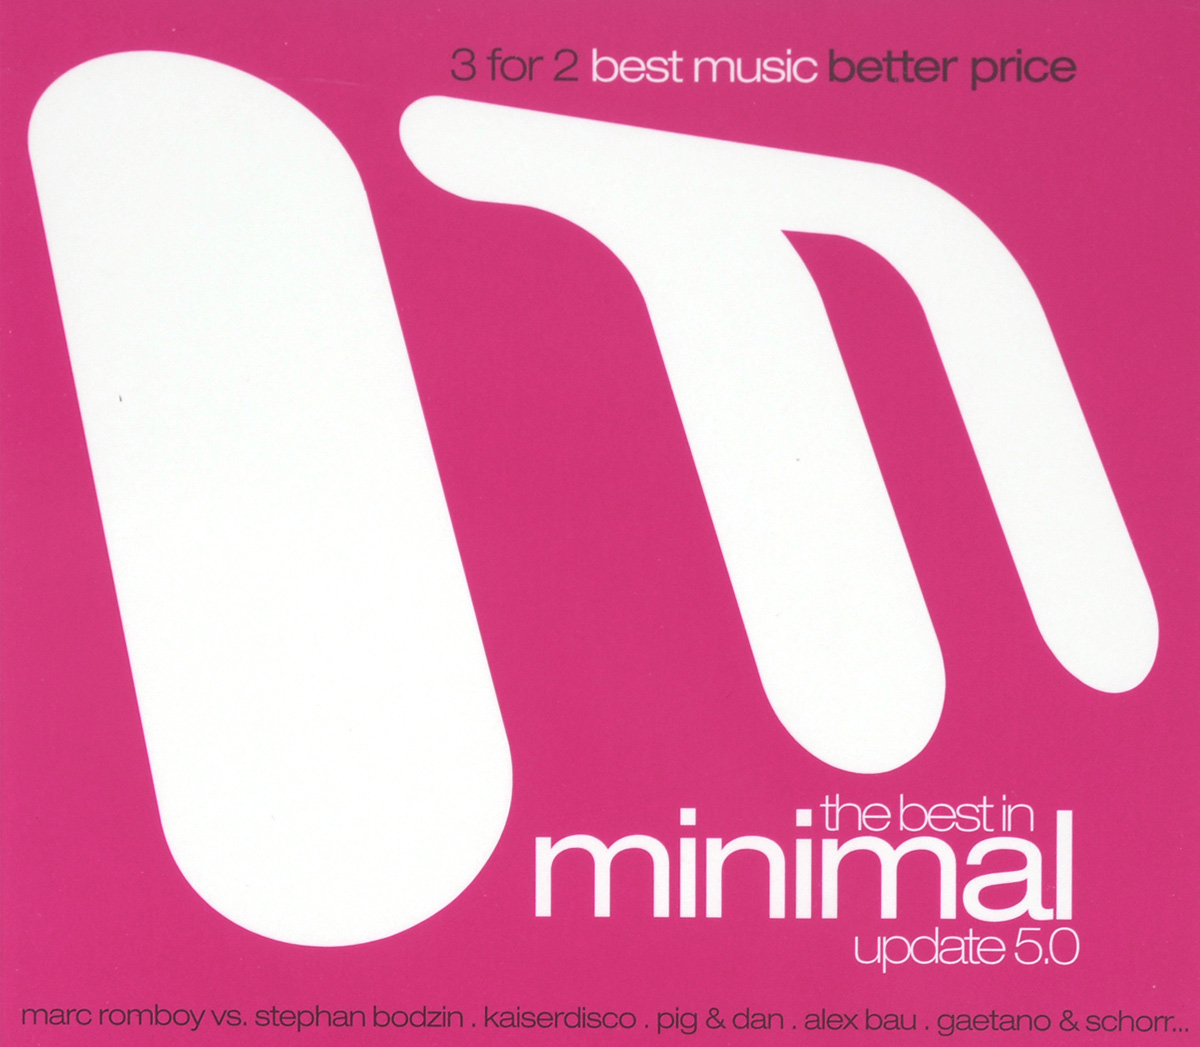 The Best In Minimal Update 5.0 (3 CD) михаил плетнев филип лейджер роджер норрингтон джон нельсон сабин мейер best adagios 50 3 cd